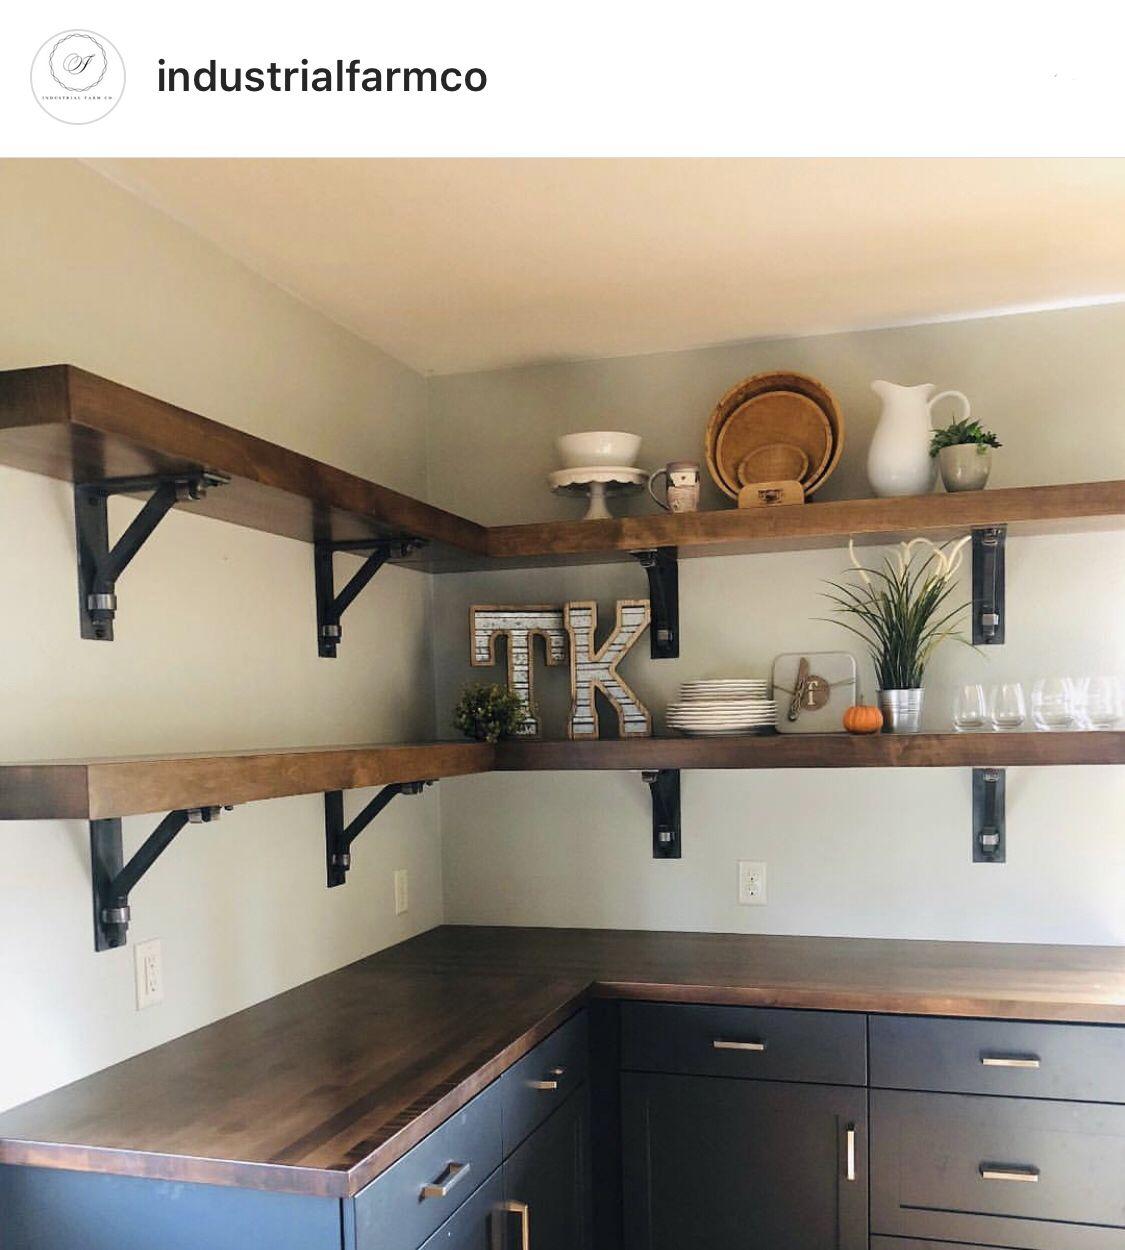 Shelf Brackets Kitchen Style Kitchen Remodel Kitchen Cabinets